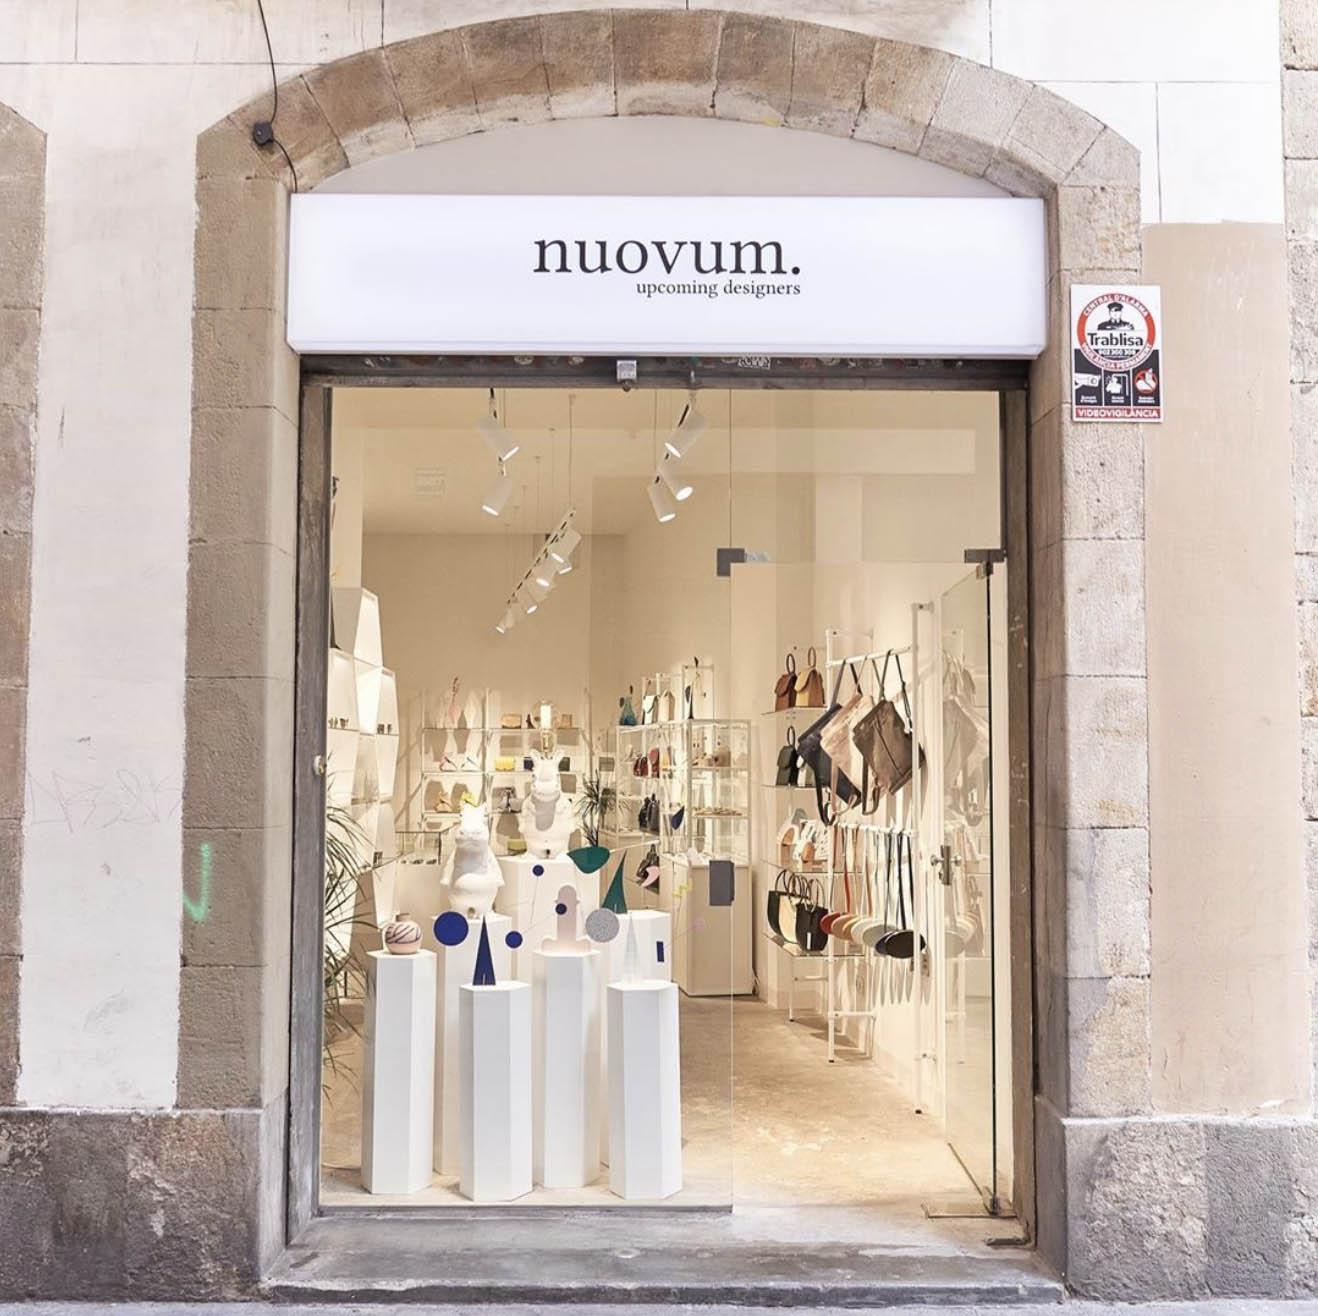 Vitrine de la boutique Nuovum, à Barcelone